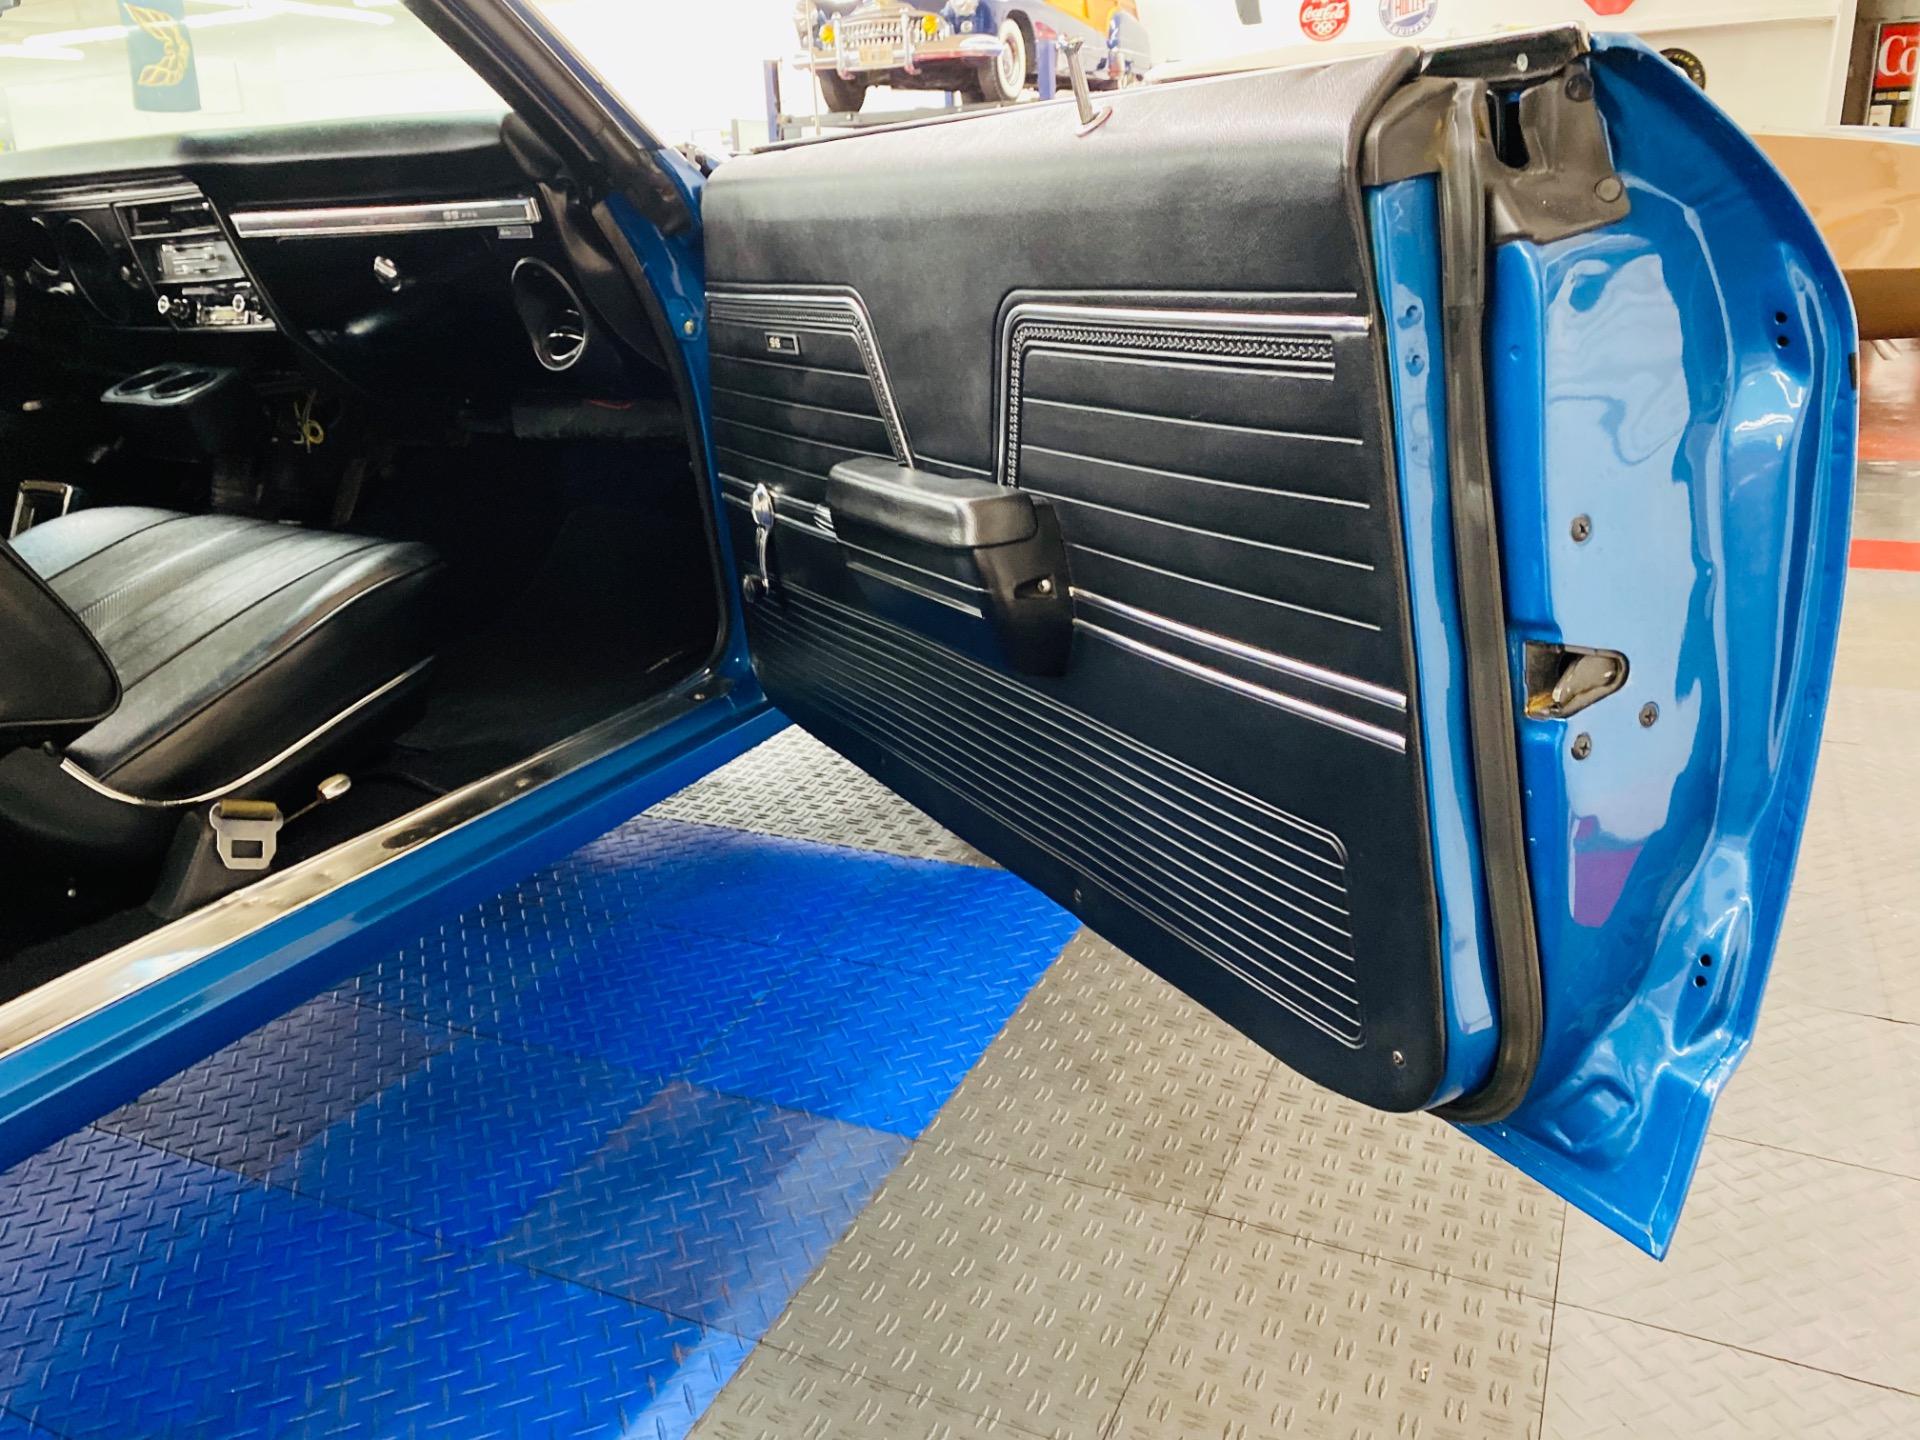 Used 1969 Chevrolet Chevelle -SUPER SPORT TRIBUTE - CODE 71 LEMANS BLUE - BUILT 396 ENGINE - | Mundelein, IL